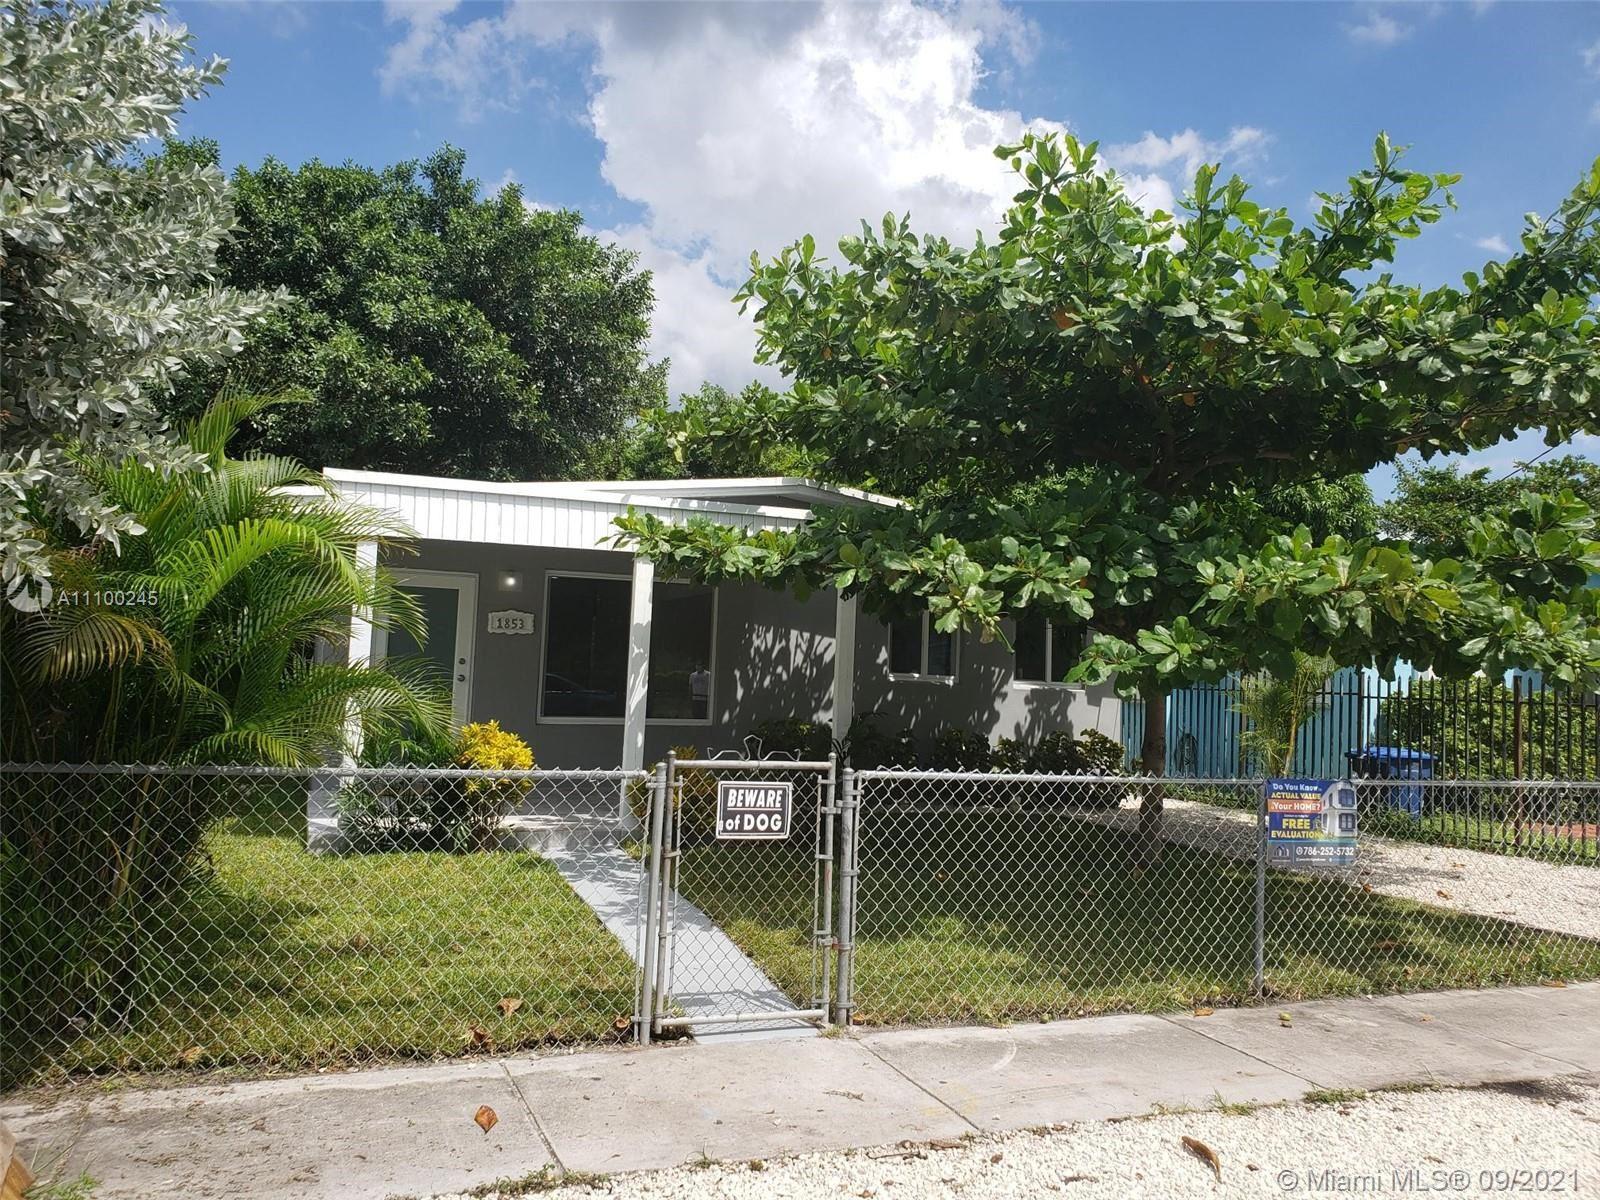 1853 NW 63rd St, Miami, FL 33147 - #: A11100245